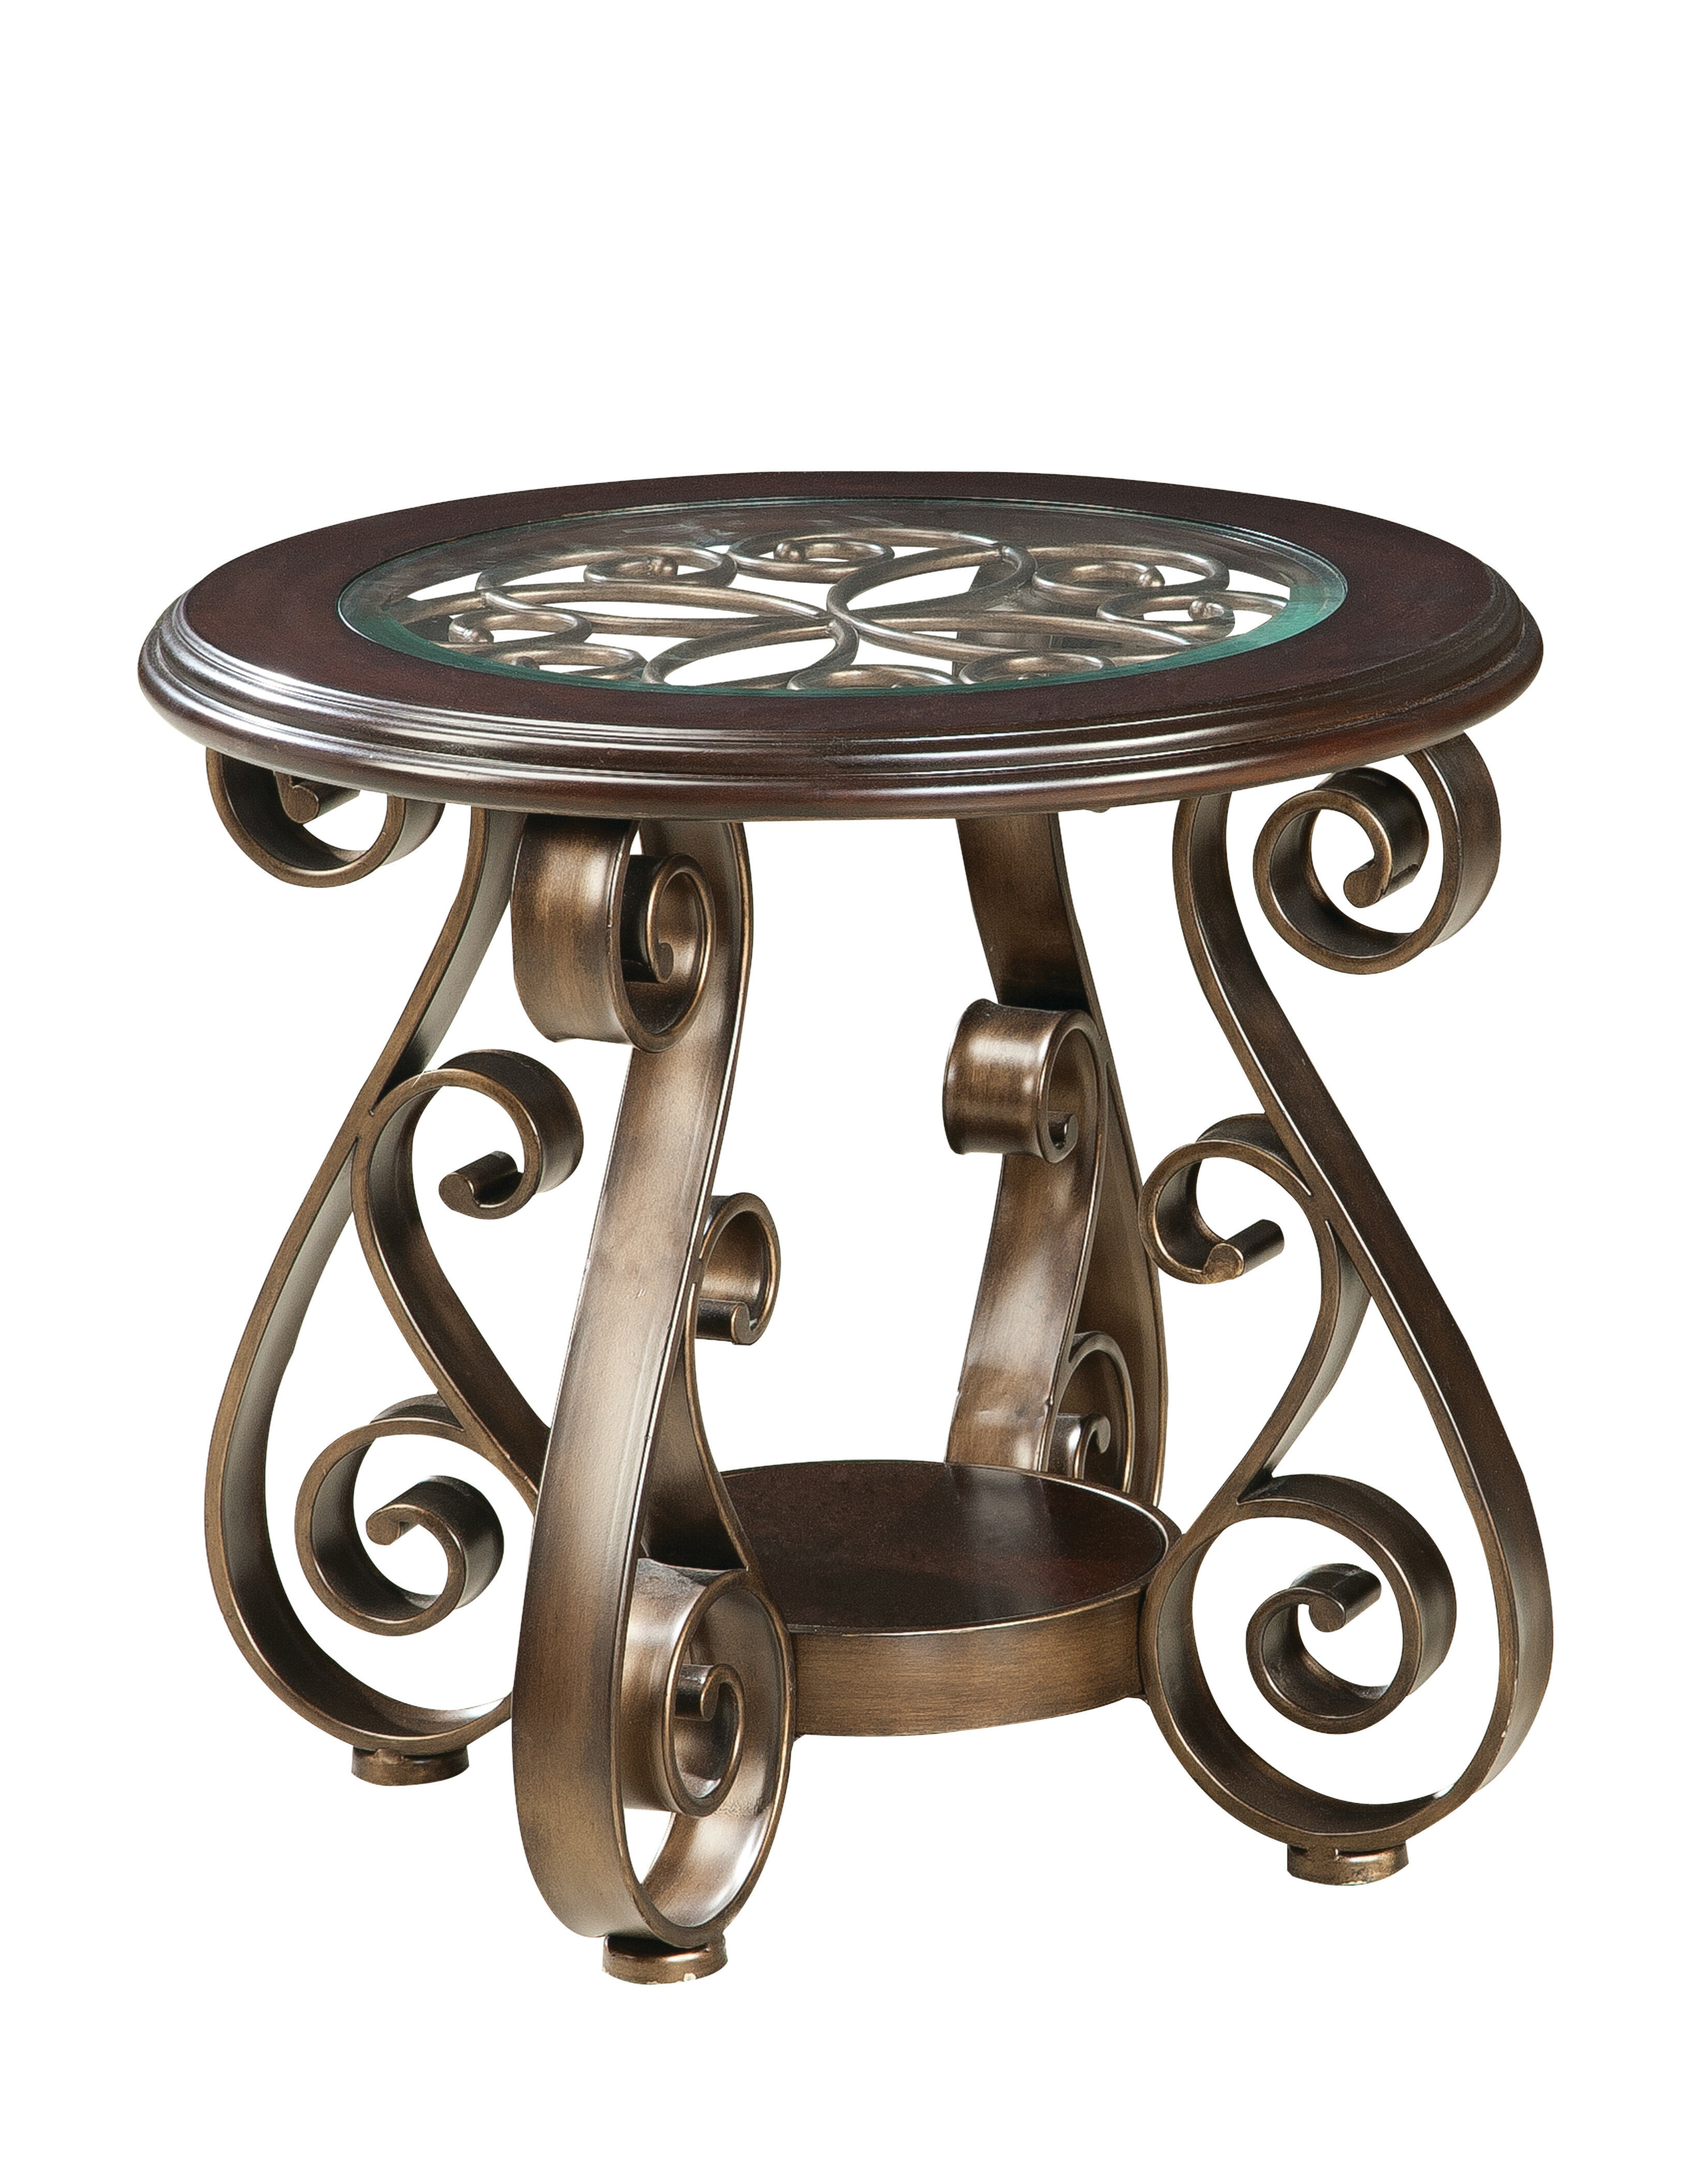 Antique Wooden End Tables